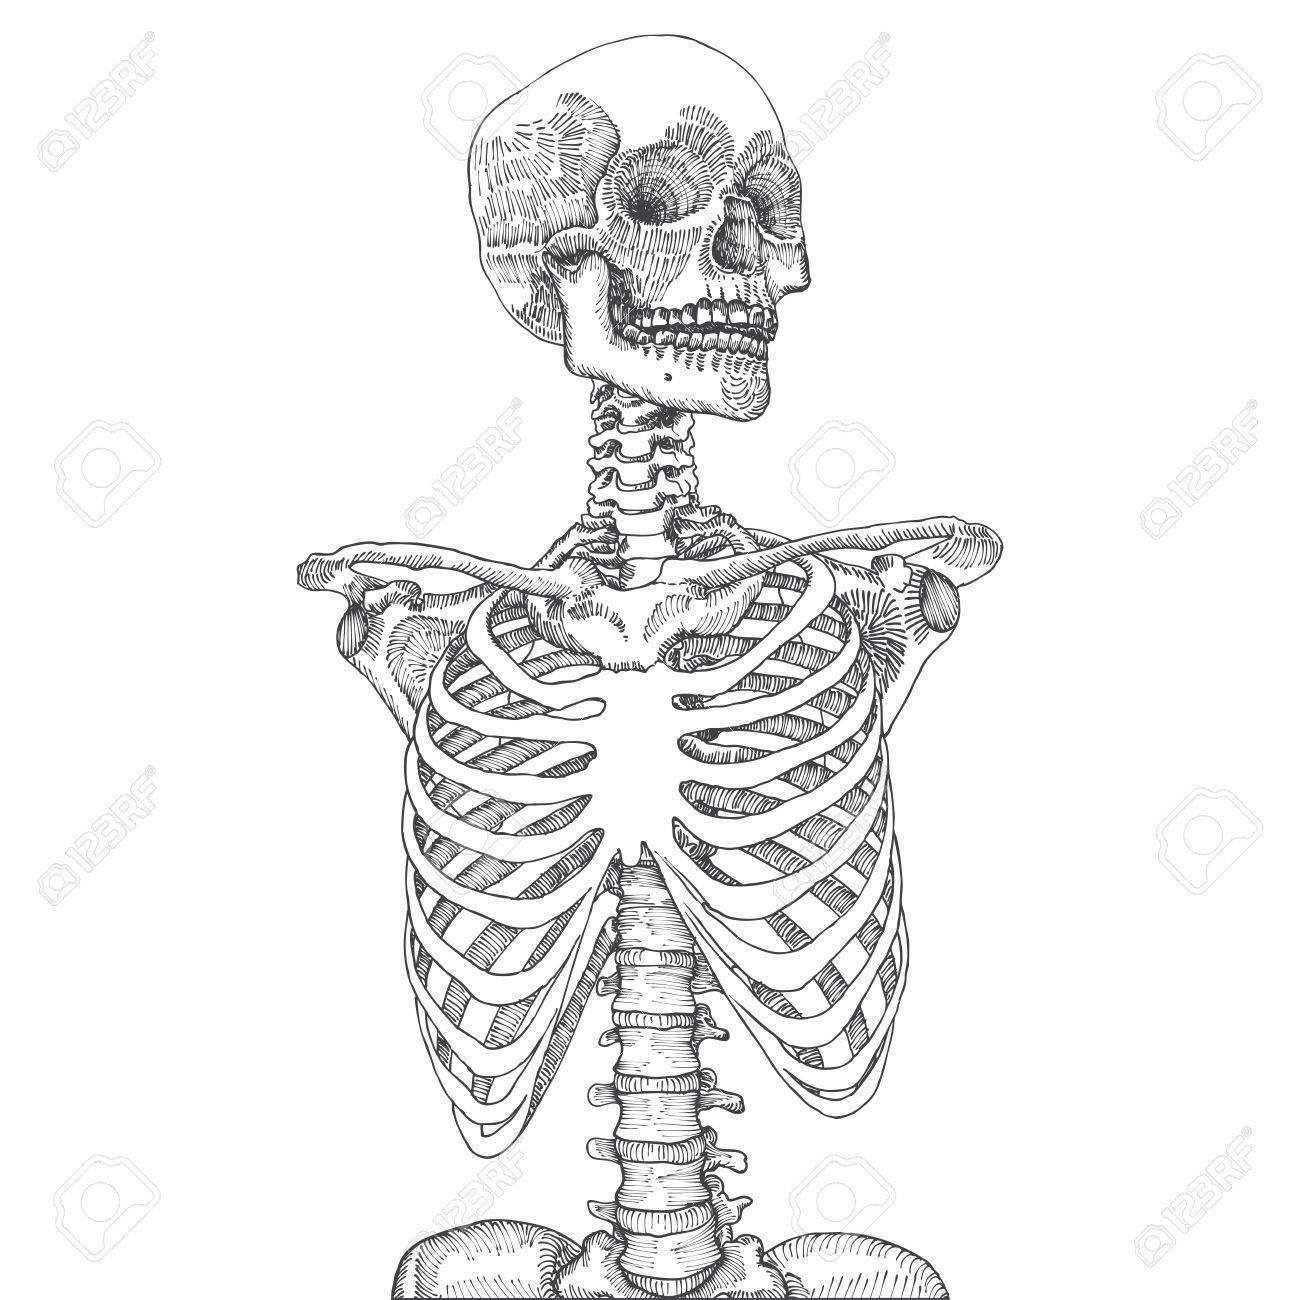 Anatomical Skeleton Drawing At Getdrawings